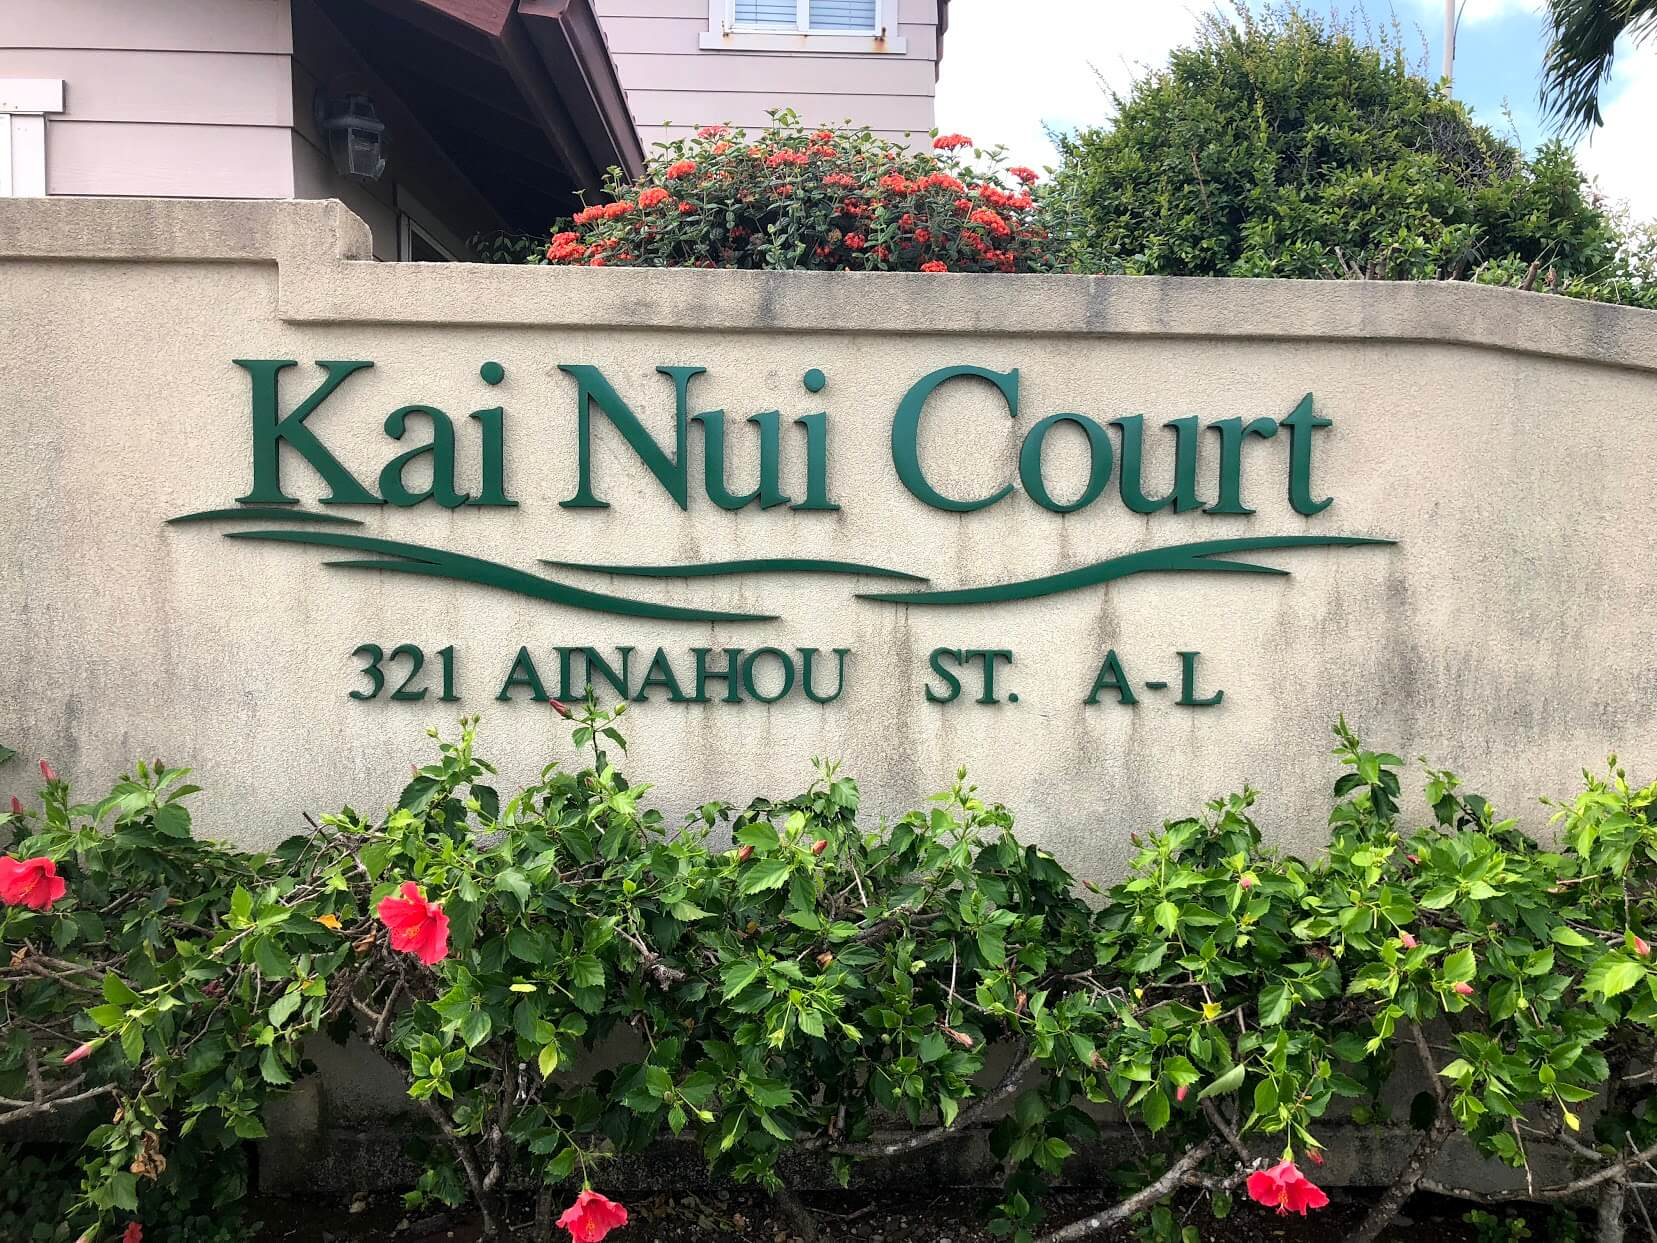 Kai Nui Courtの看板